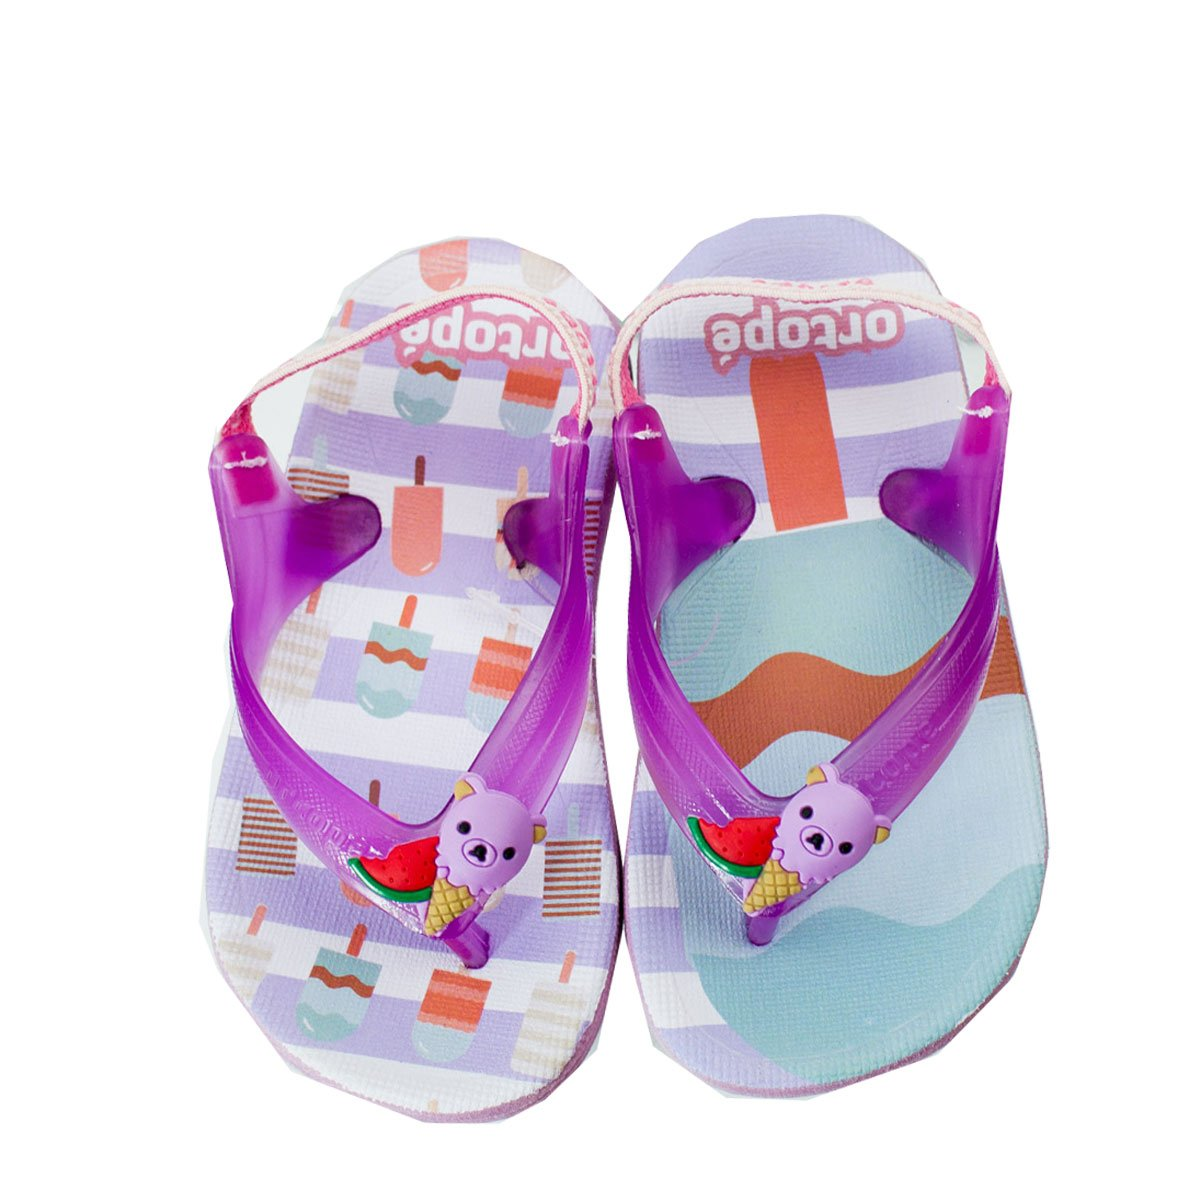 b30ee3bc0bbdc Bizz Store - Chinelo Infantil Feminino Ortopé Aqua Flex PVC Pink